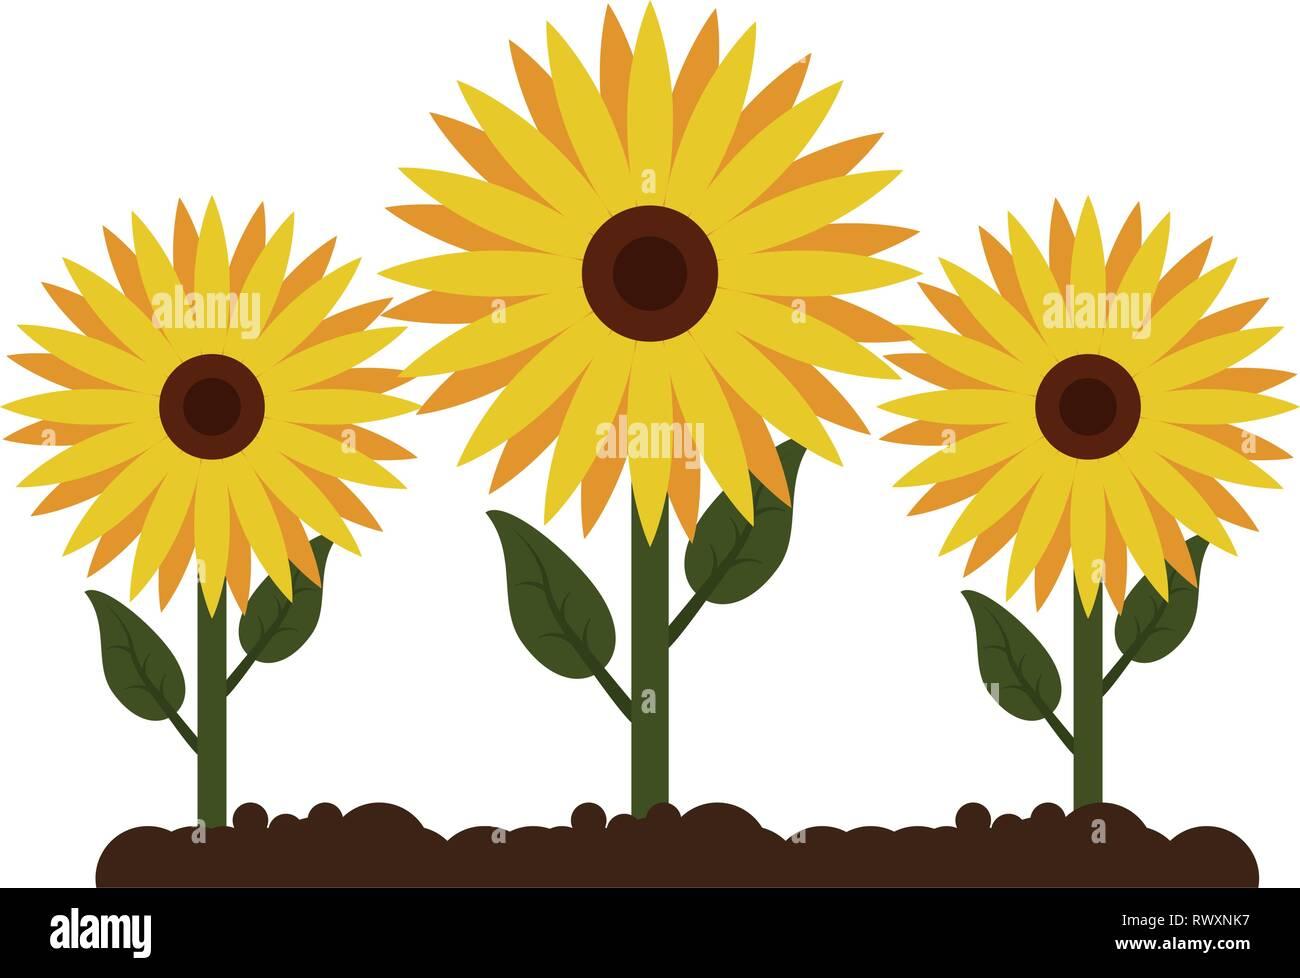 Sunflowers Gardening Cartoon Isolated Stock Vector Image Art Alamy